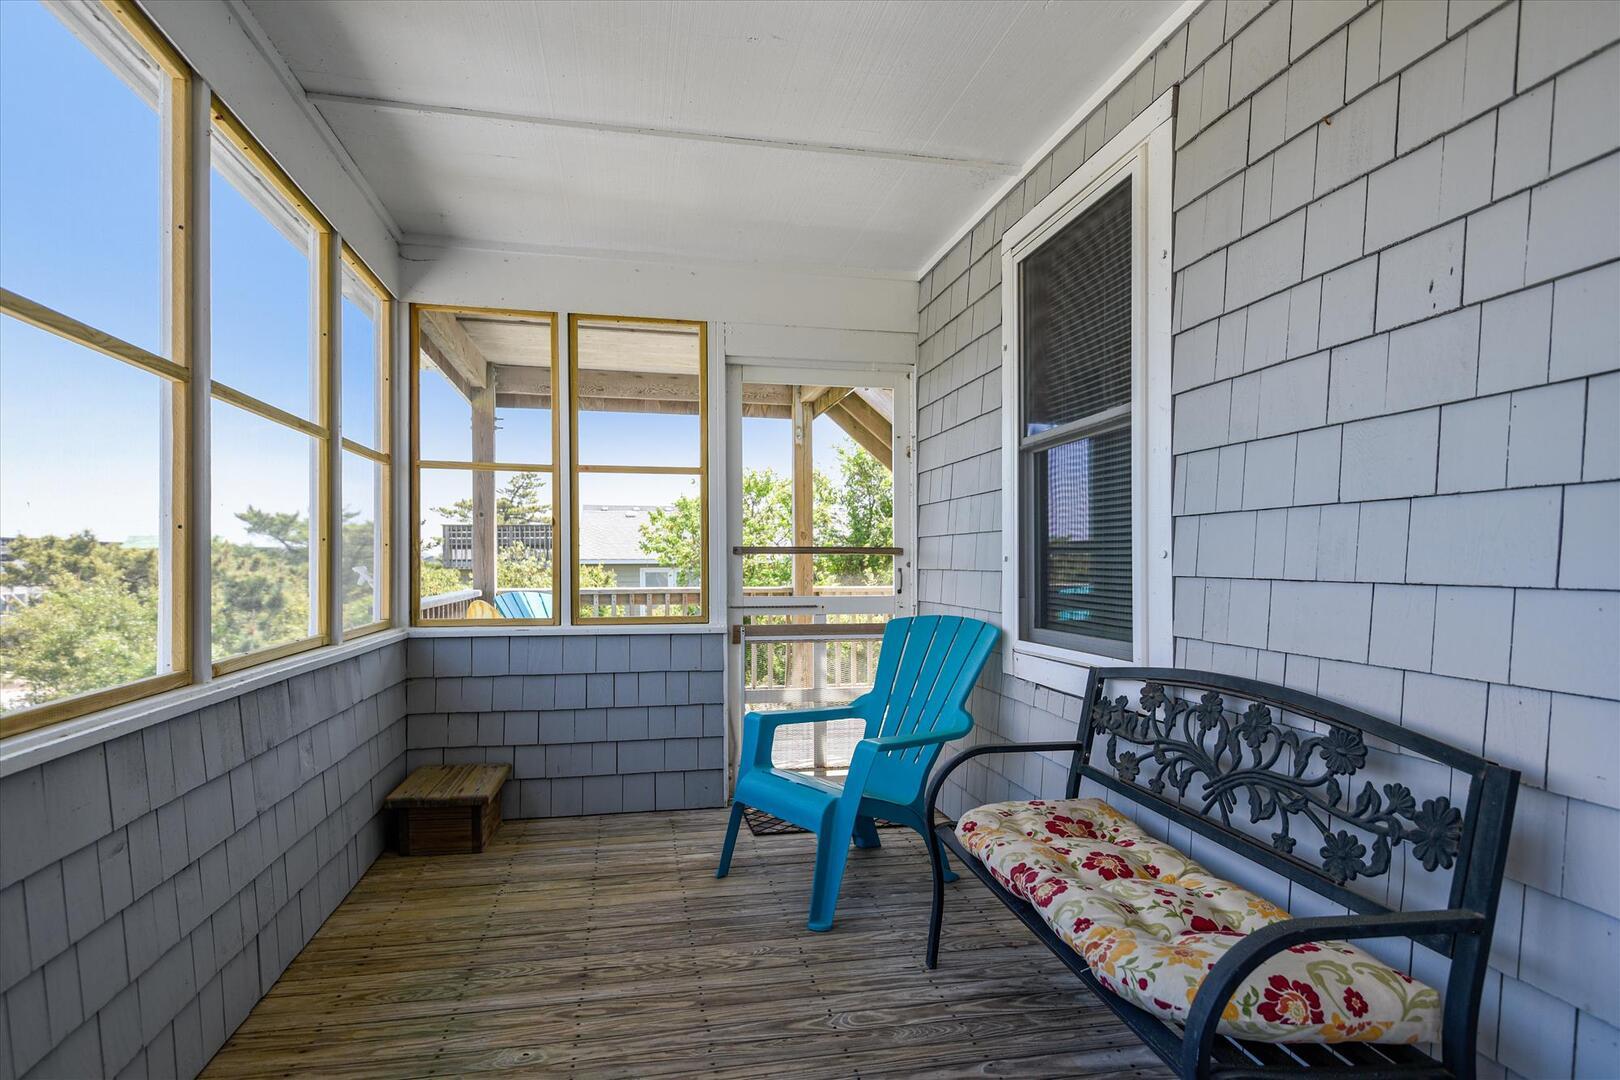 Main Level,Screened Porch,